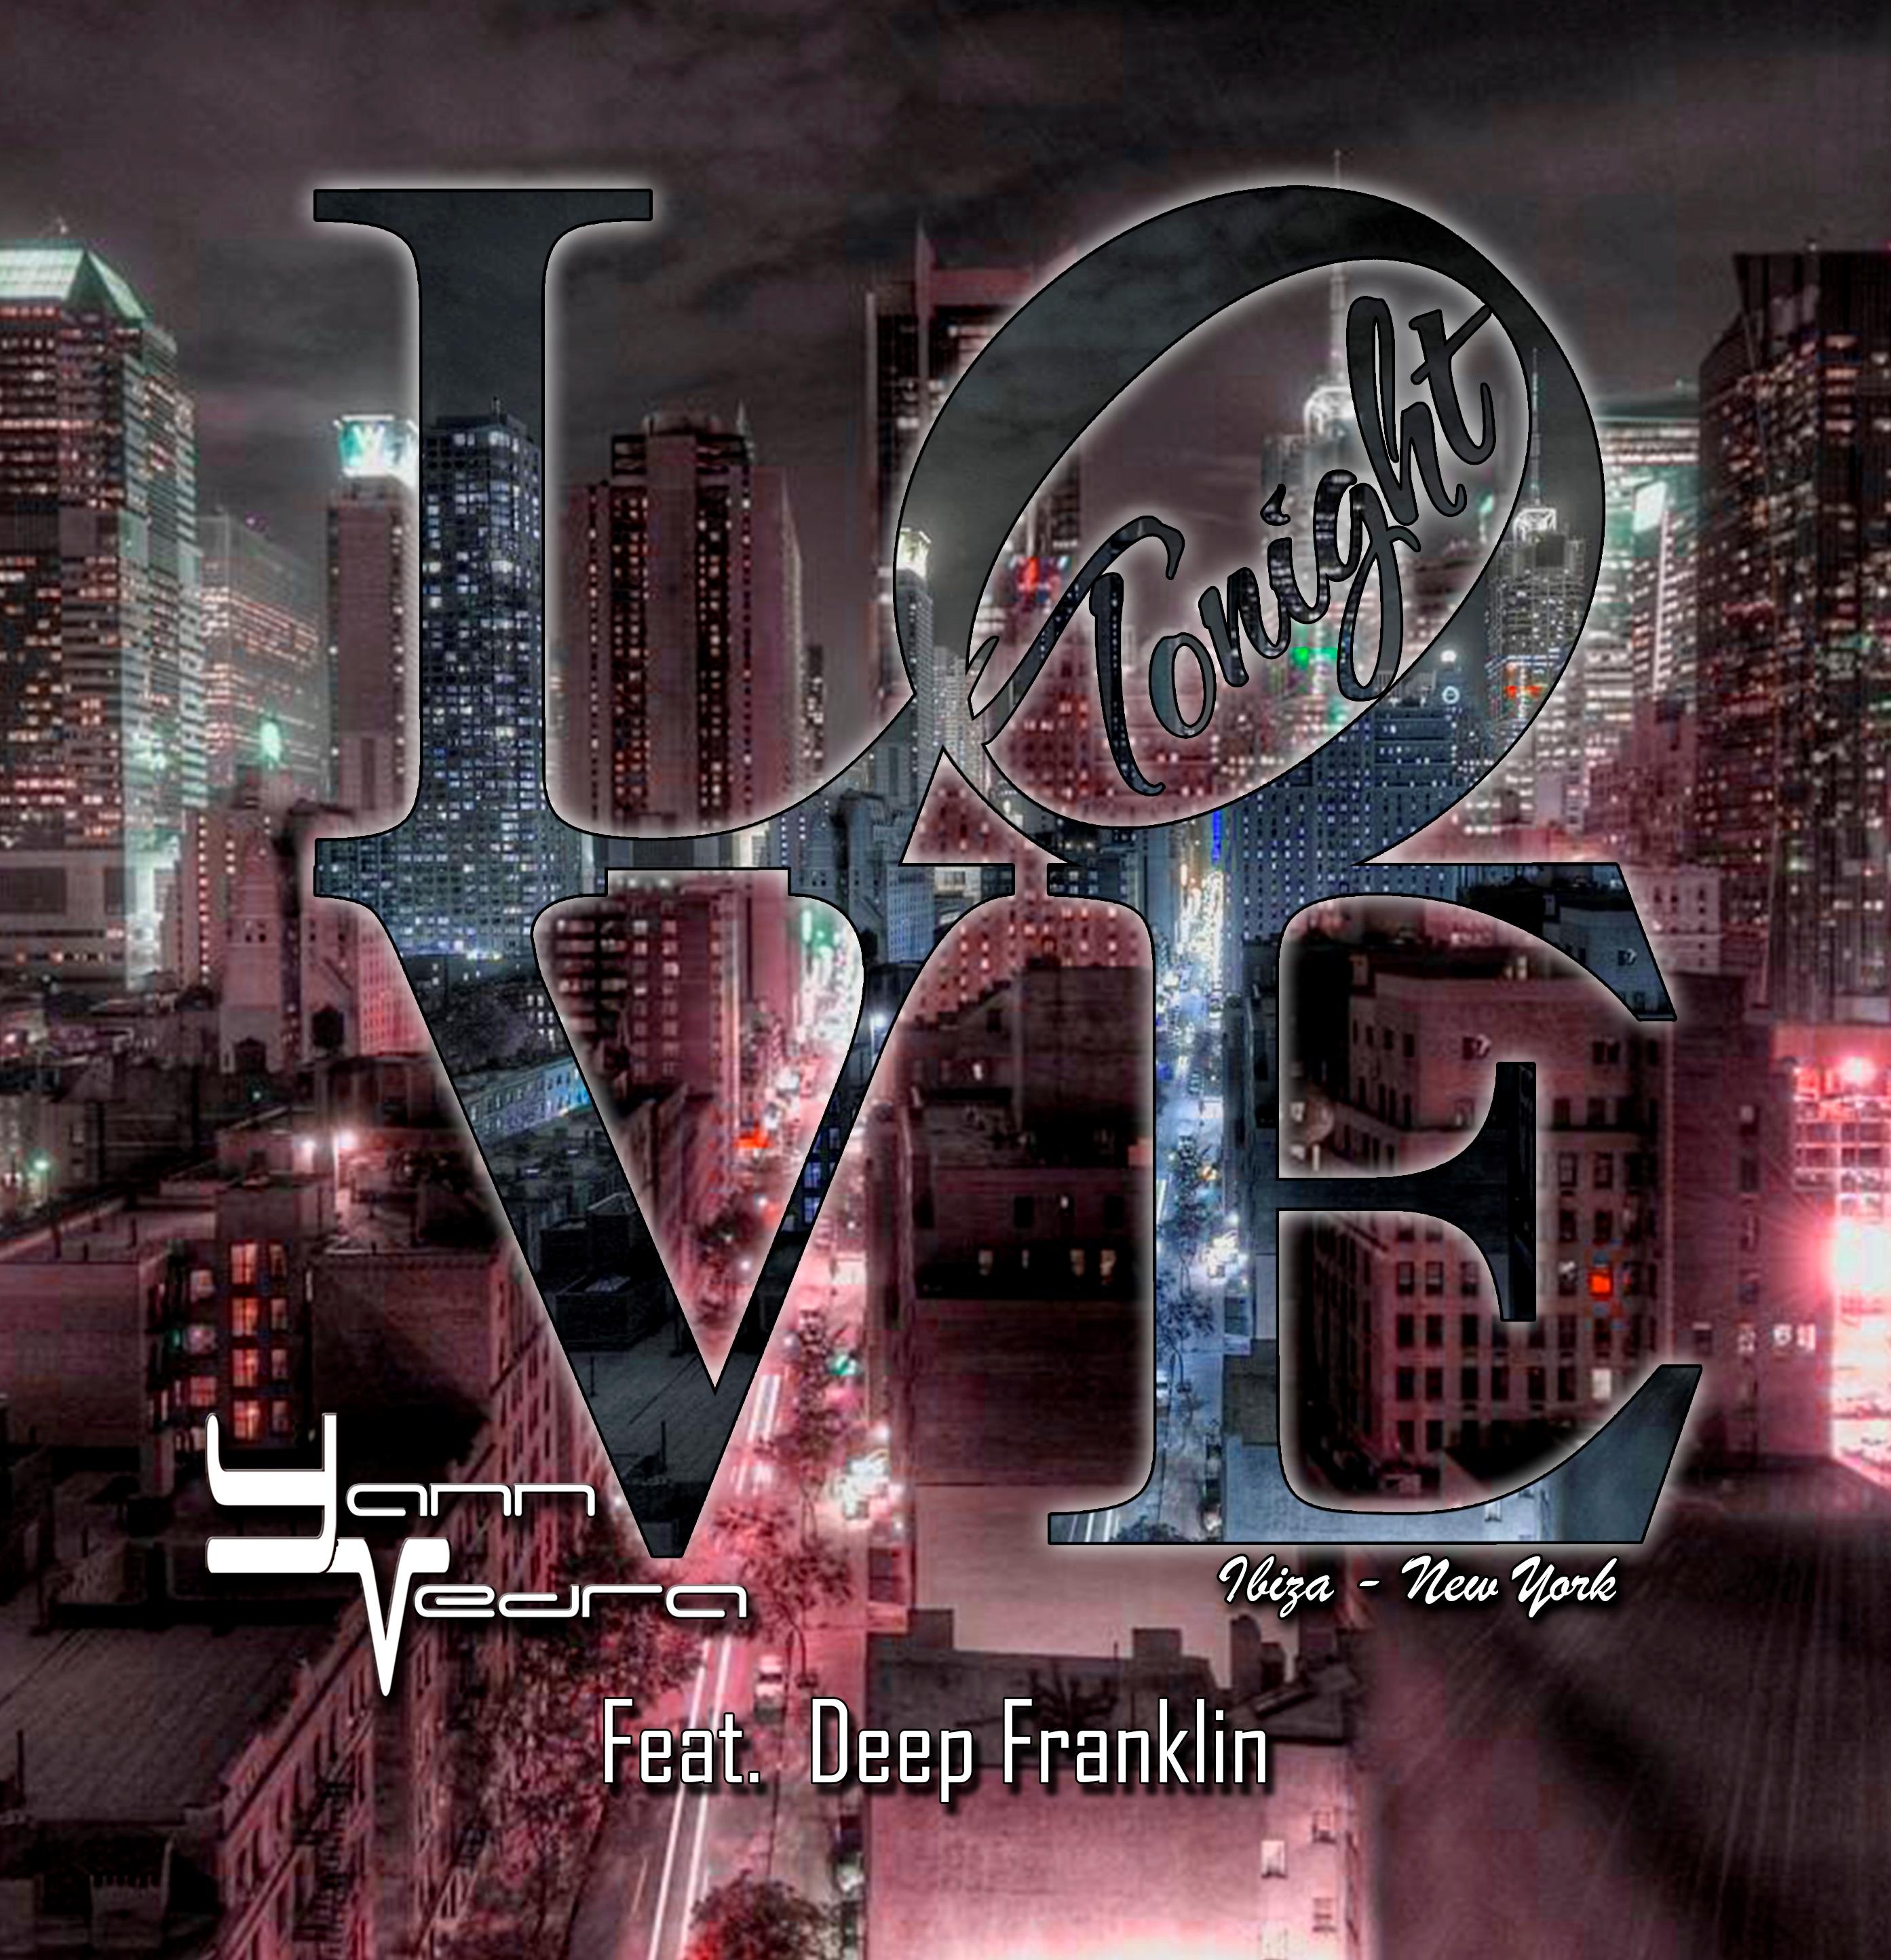 YANN VEDRA Feat DEEP FRANKLIN Love Tonight (Ibiza, New York)